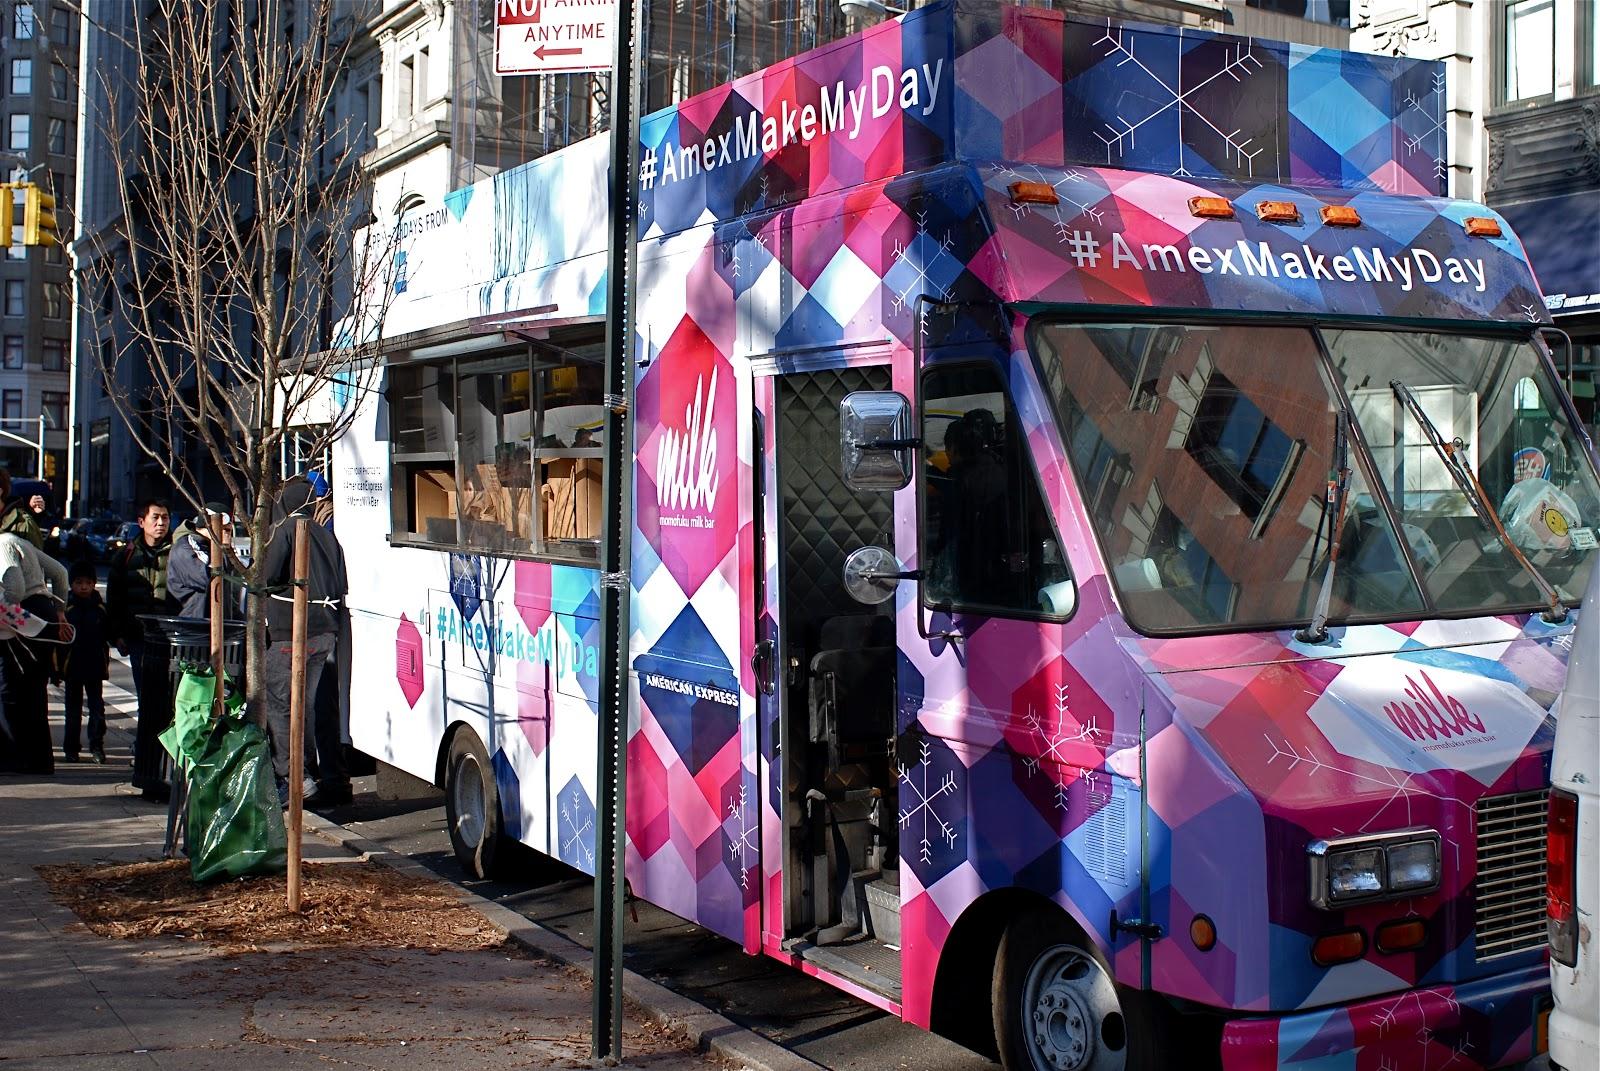 Momofuku Milk Bar Holiday Cookie Giveaway Via AmexMakeMyDay Food Truck